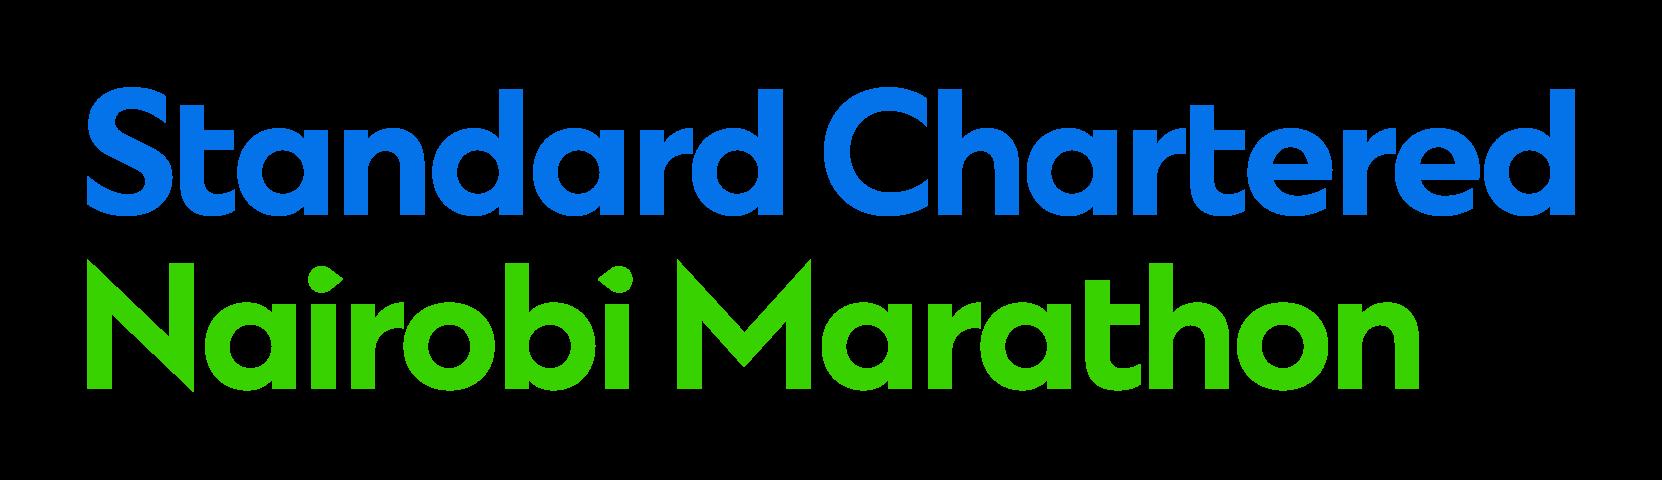 Standard Chartered Nairobi Marathon 2021